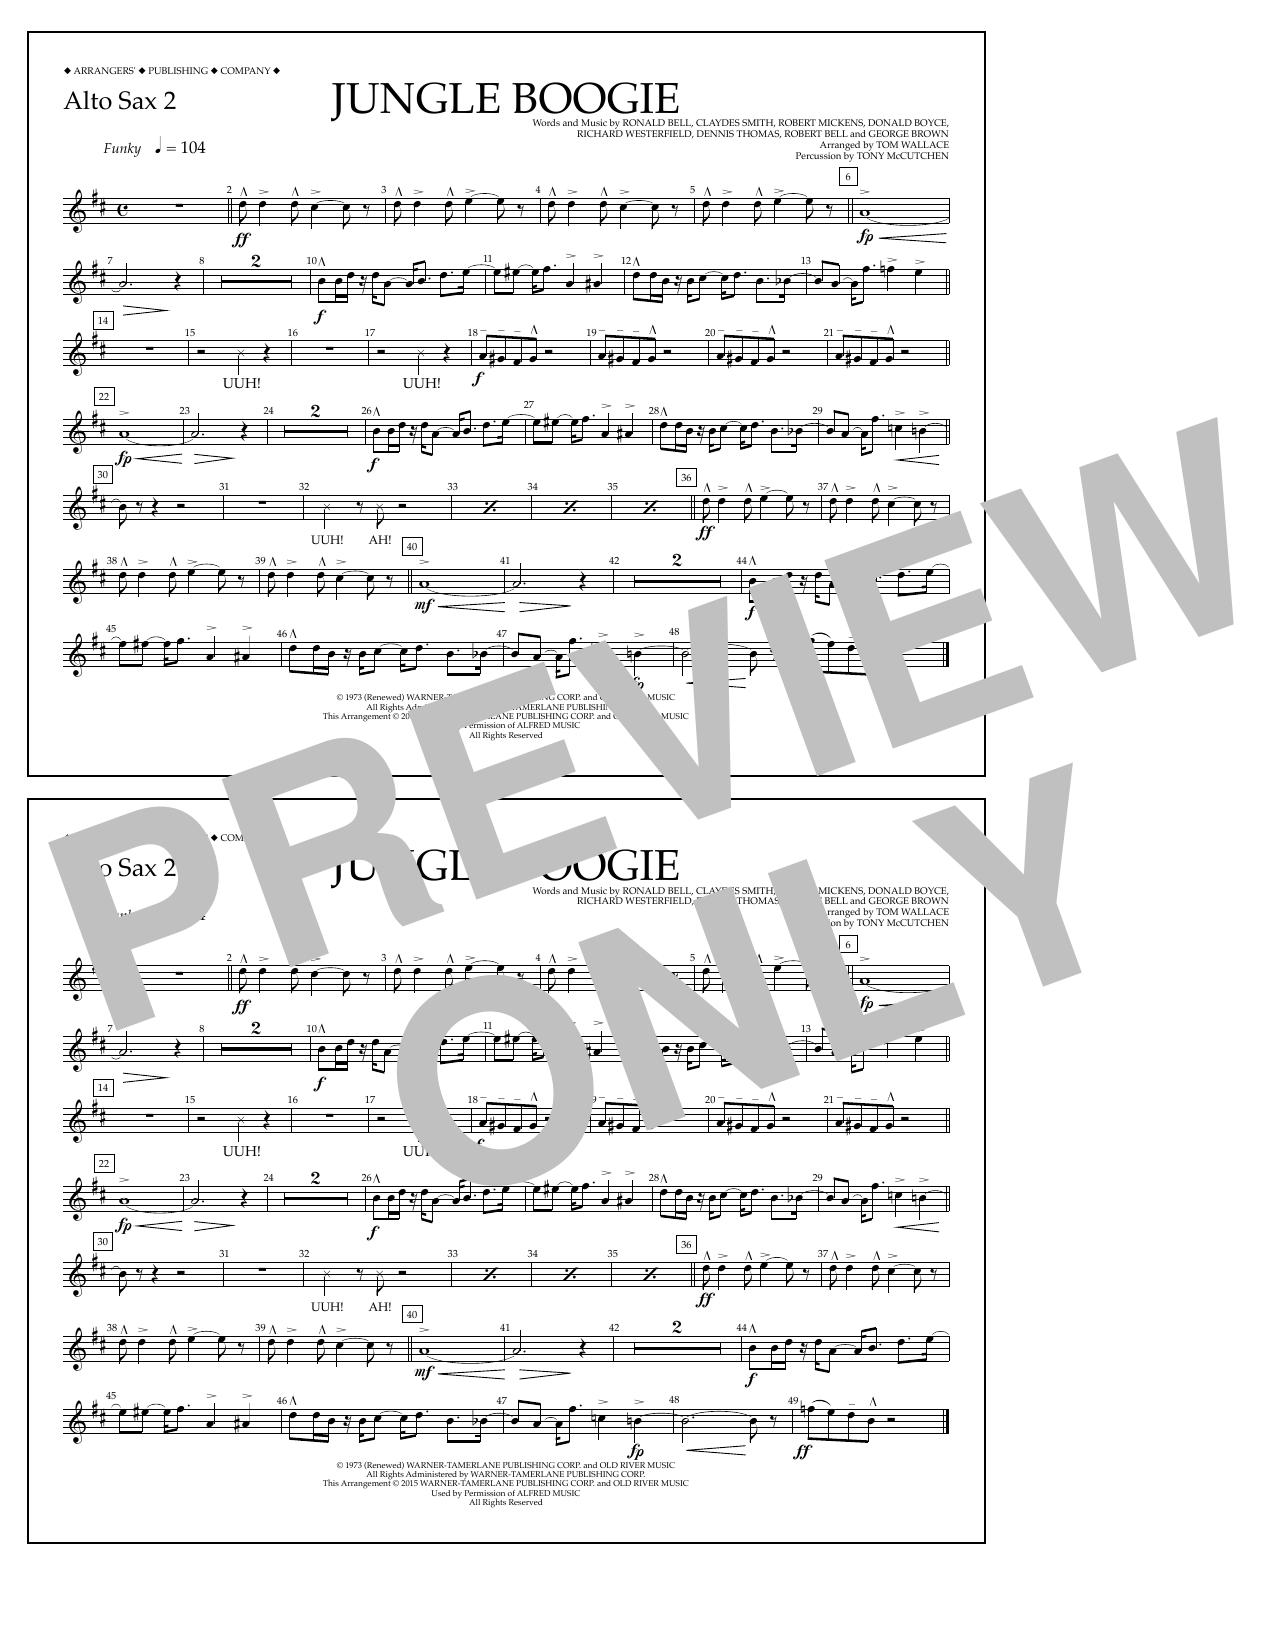 Jungle Boogie - Alto Sax 2 Sheet Music